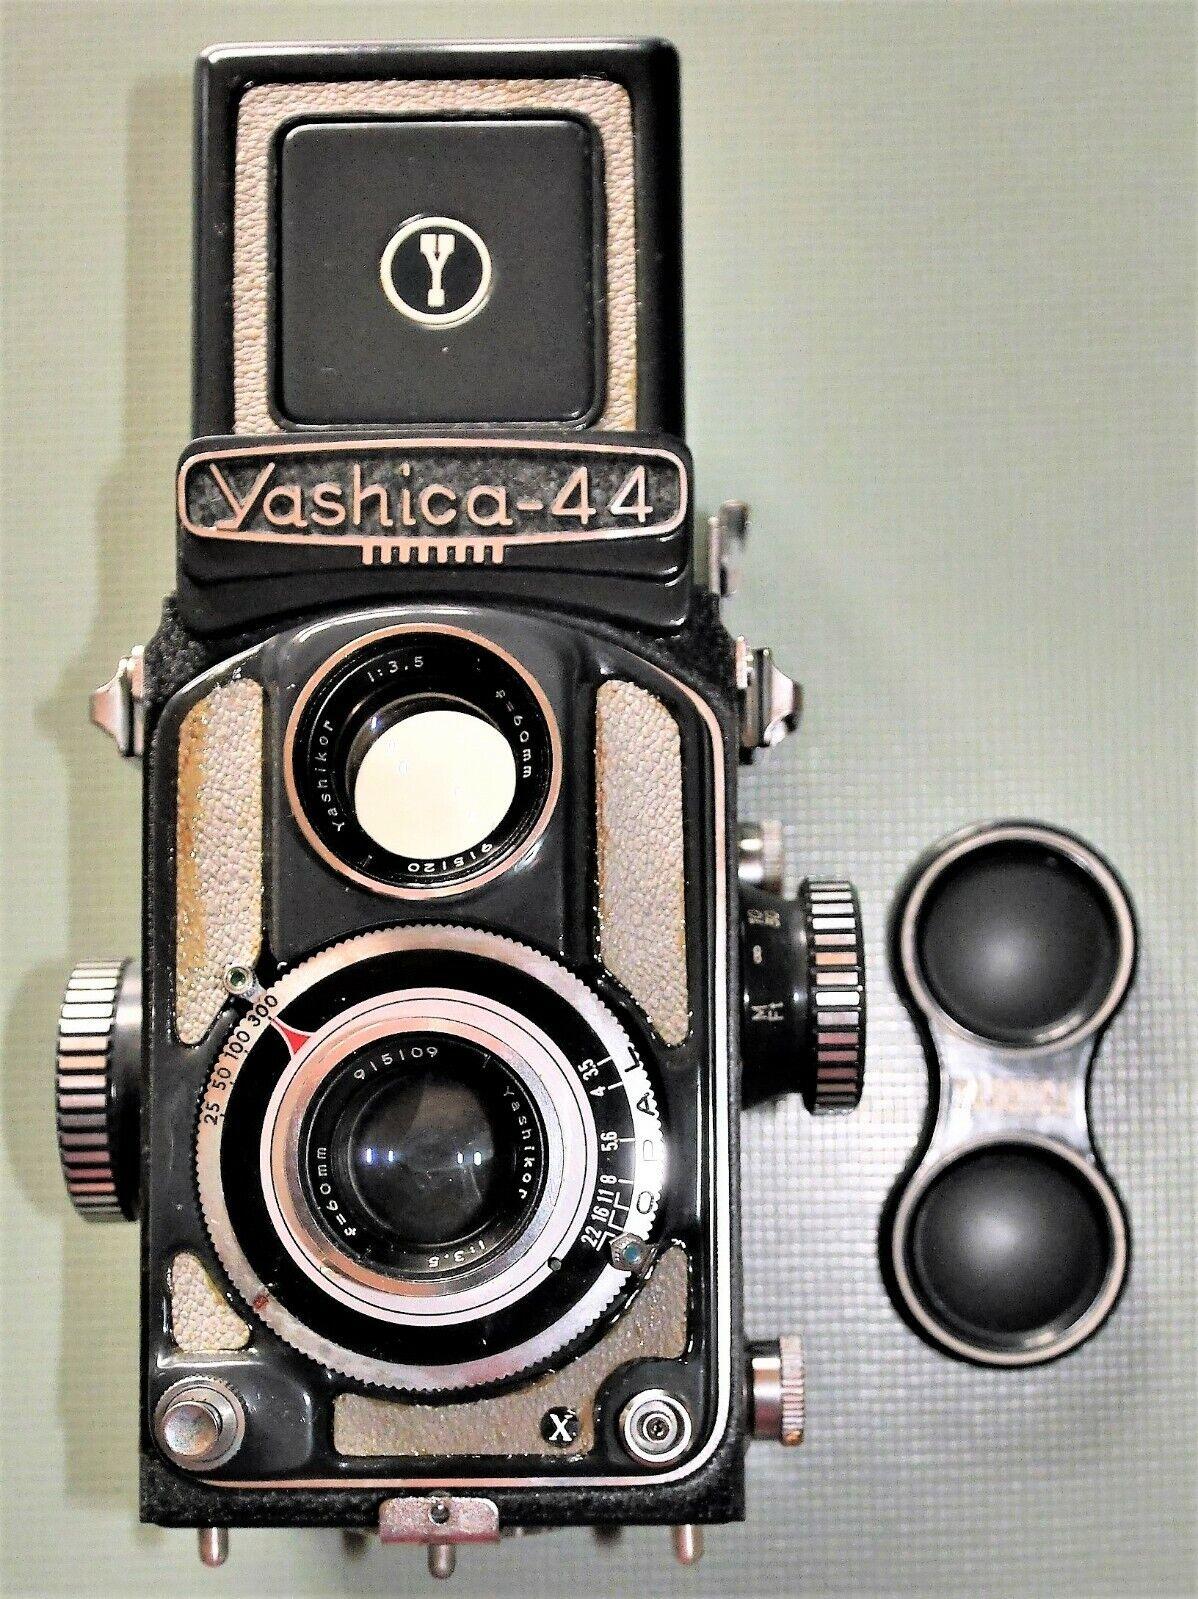 Yashica 44 Camera Filmcamera Foto-Kamera & Objektive Yashikor f=60mm Tasche 4x4